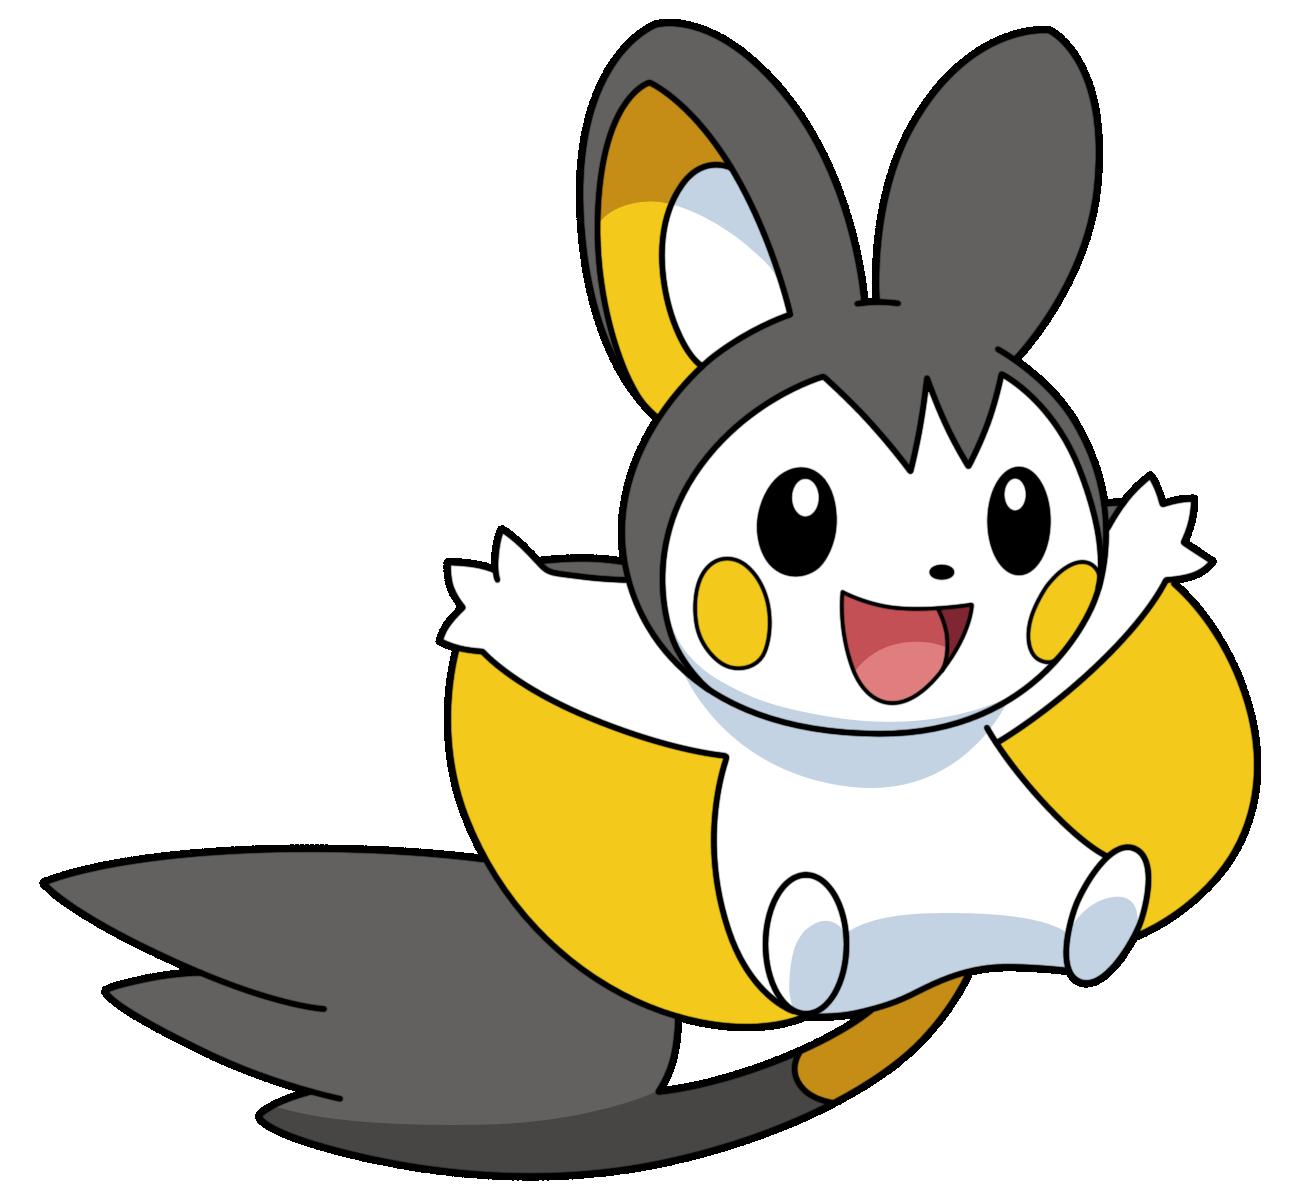 Pokemon dating sim tumblr transparents